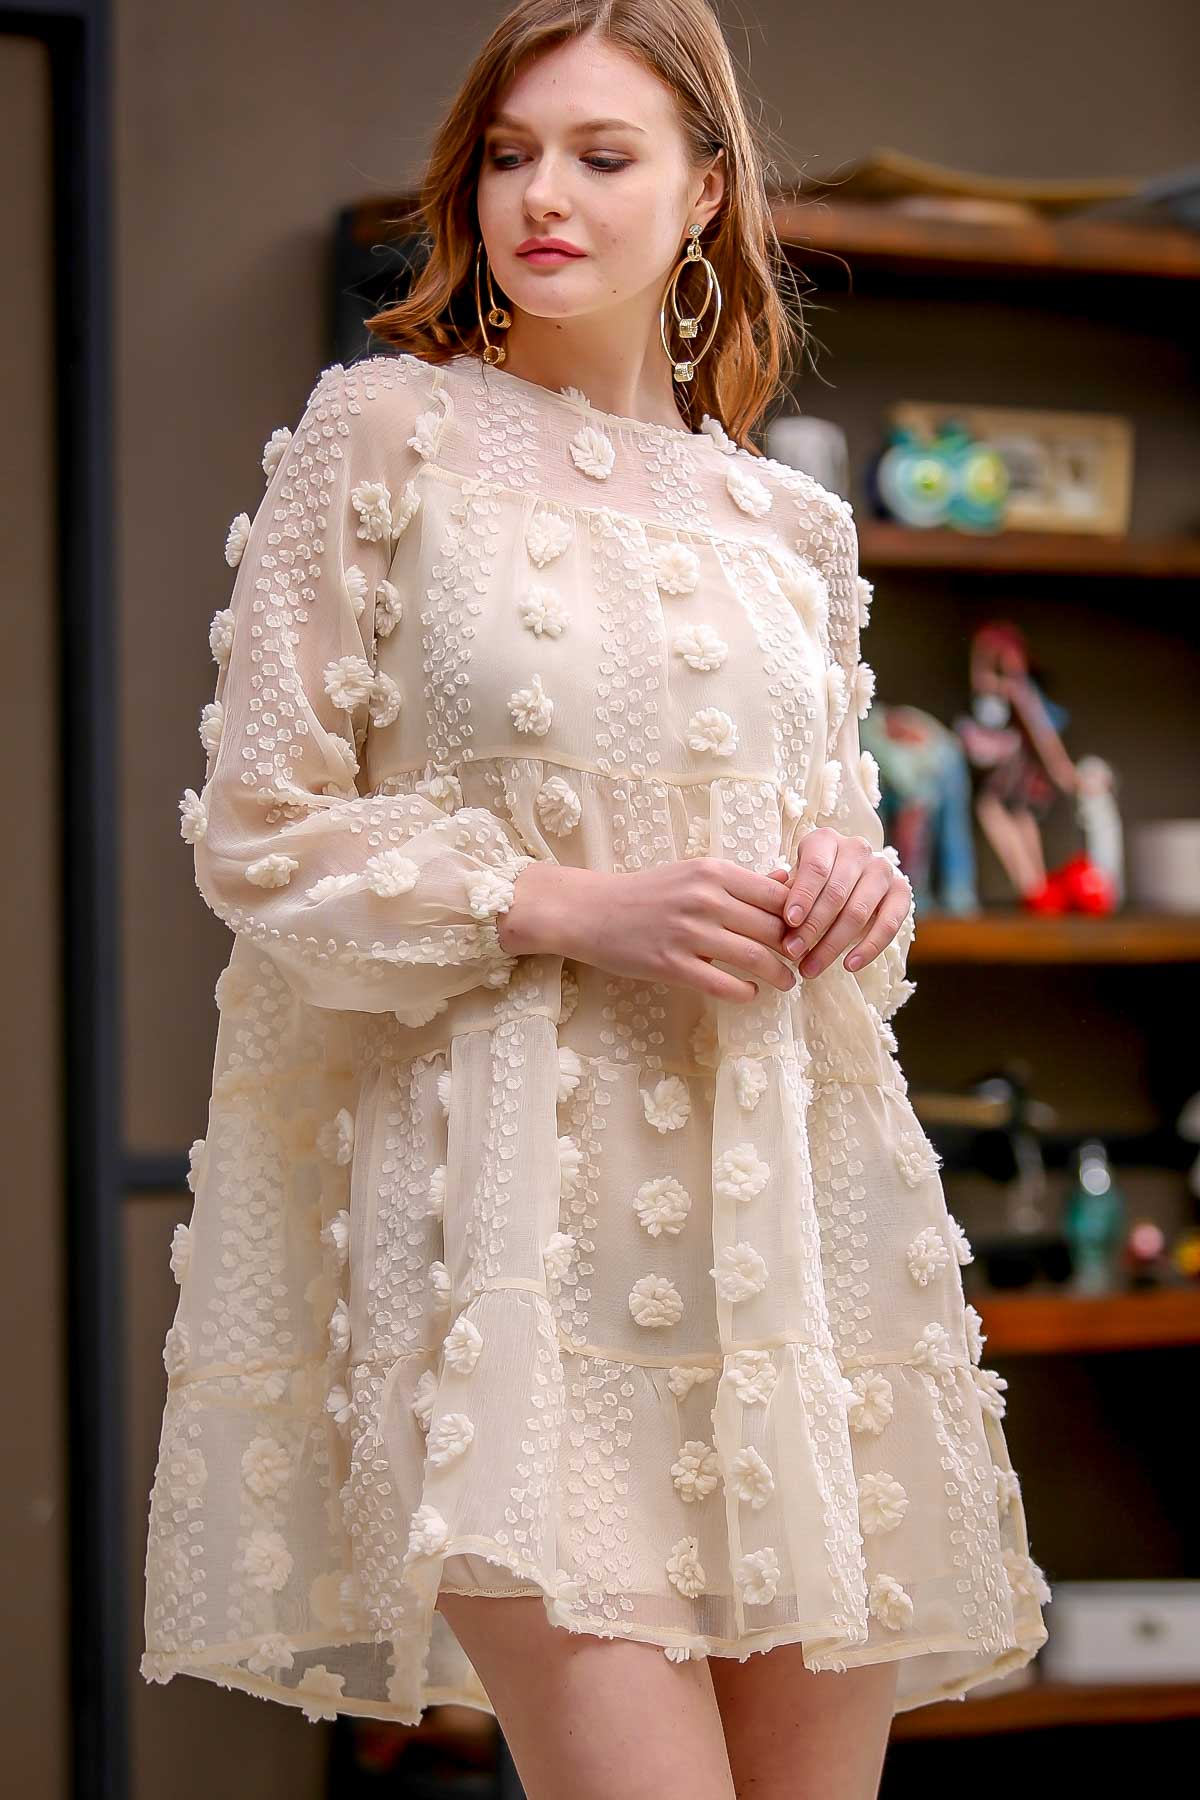 Retro gigante puffs detallada vestidos